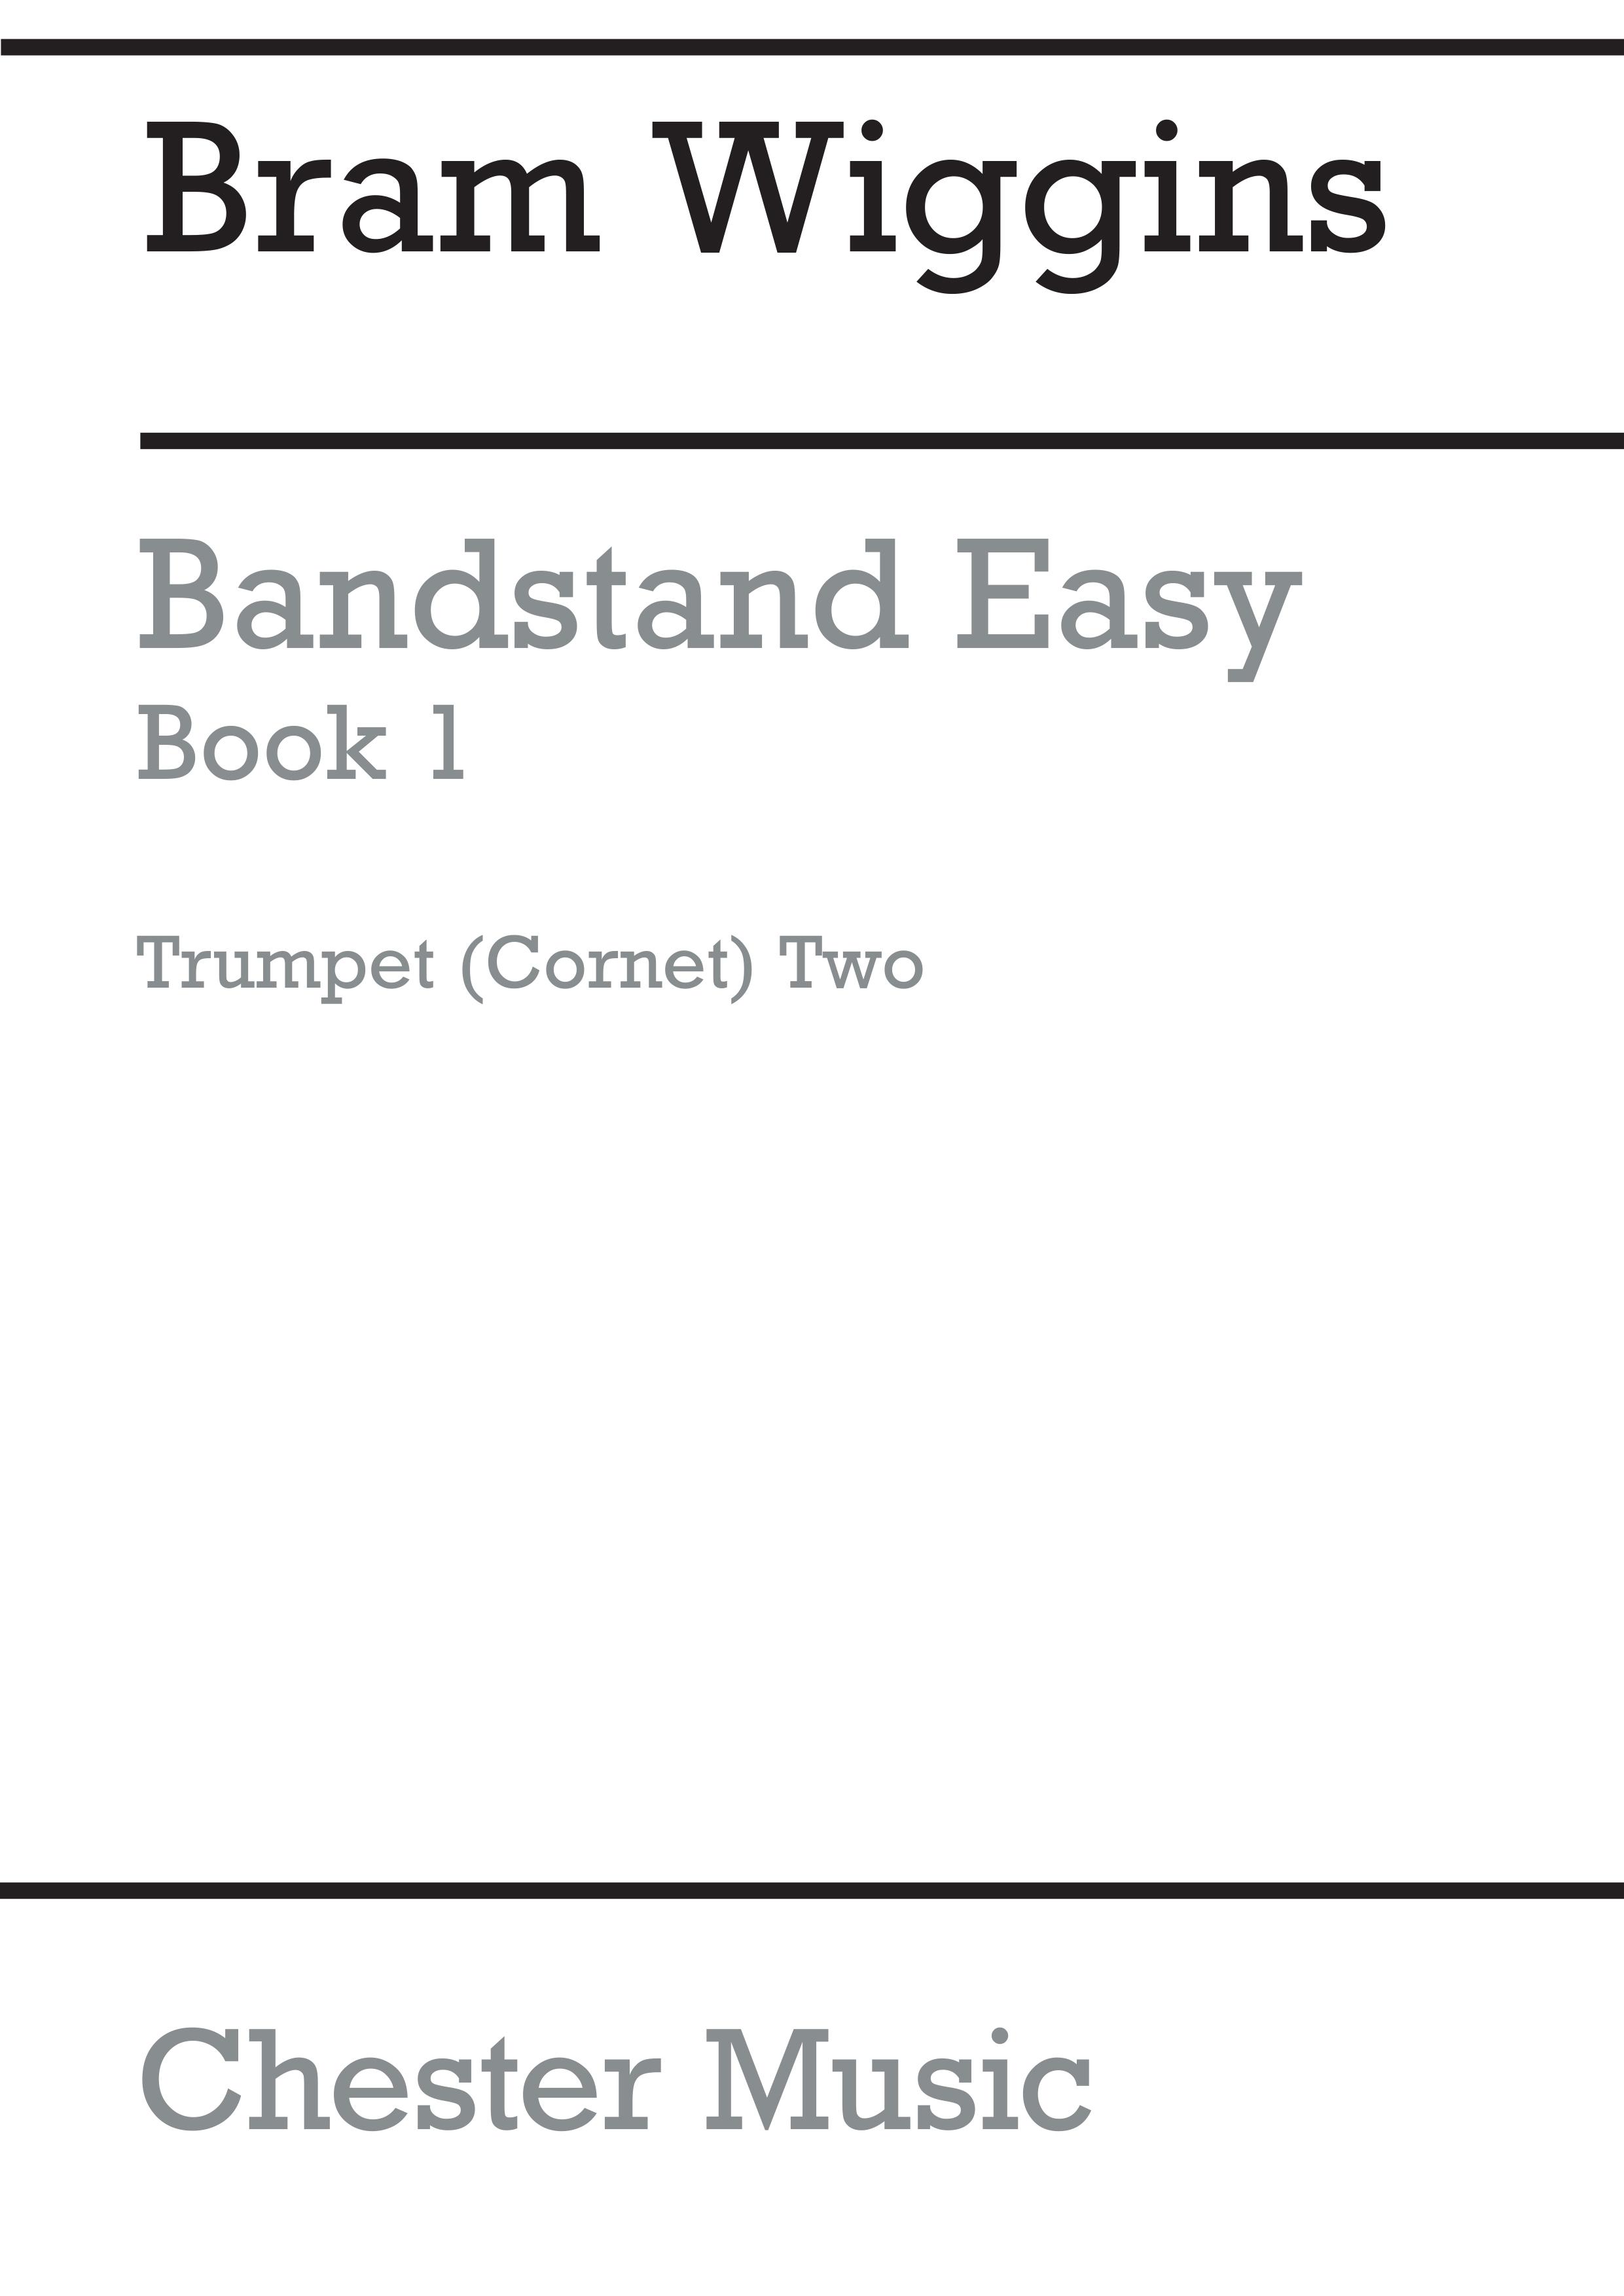 Bram Wiggins: Bandstand Easy Book 1 (Trumpet  Cornet 2): Concert Band: Part